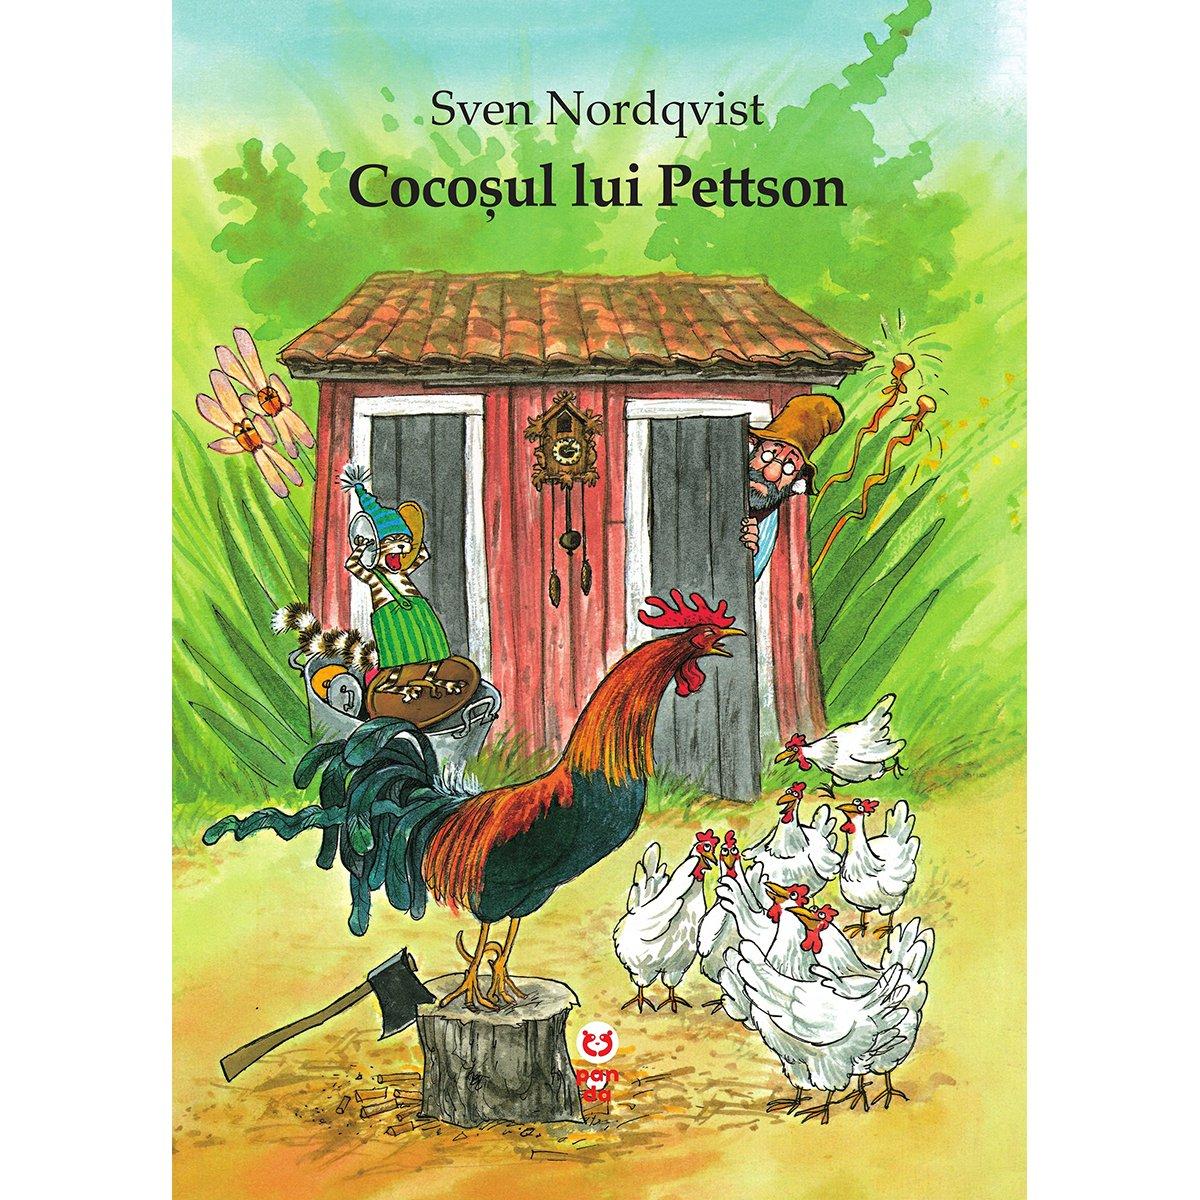 Carte Editura Pandora M, Cocosul lui Pettson, Sven Nordqvist